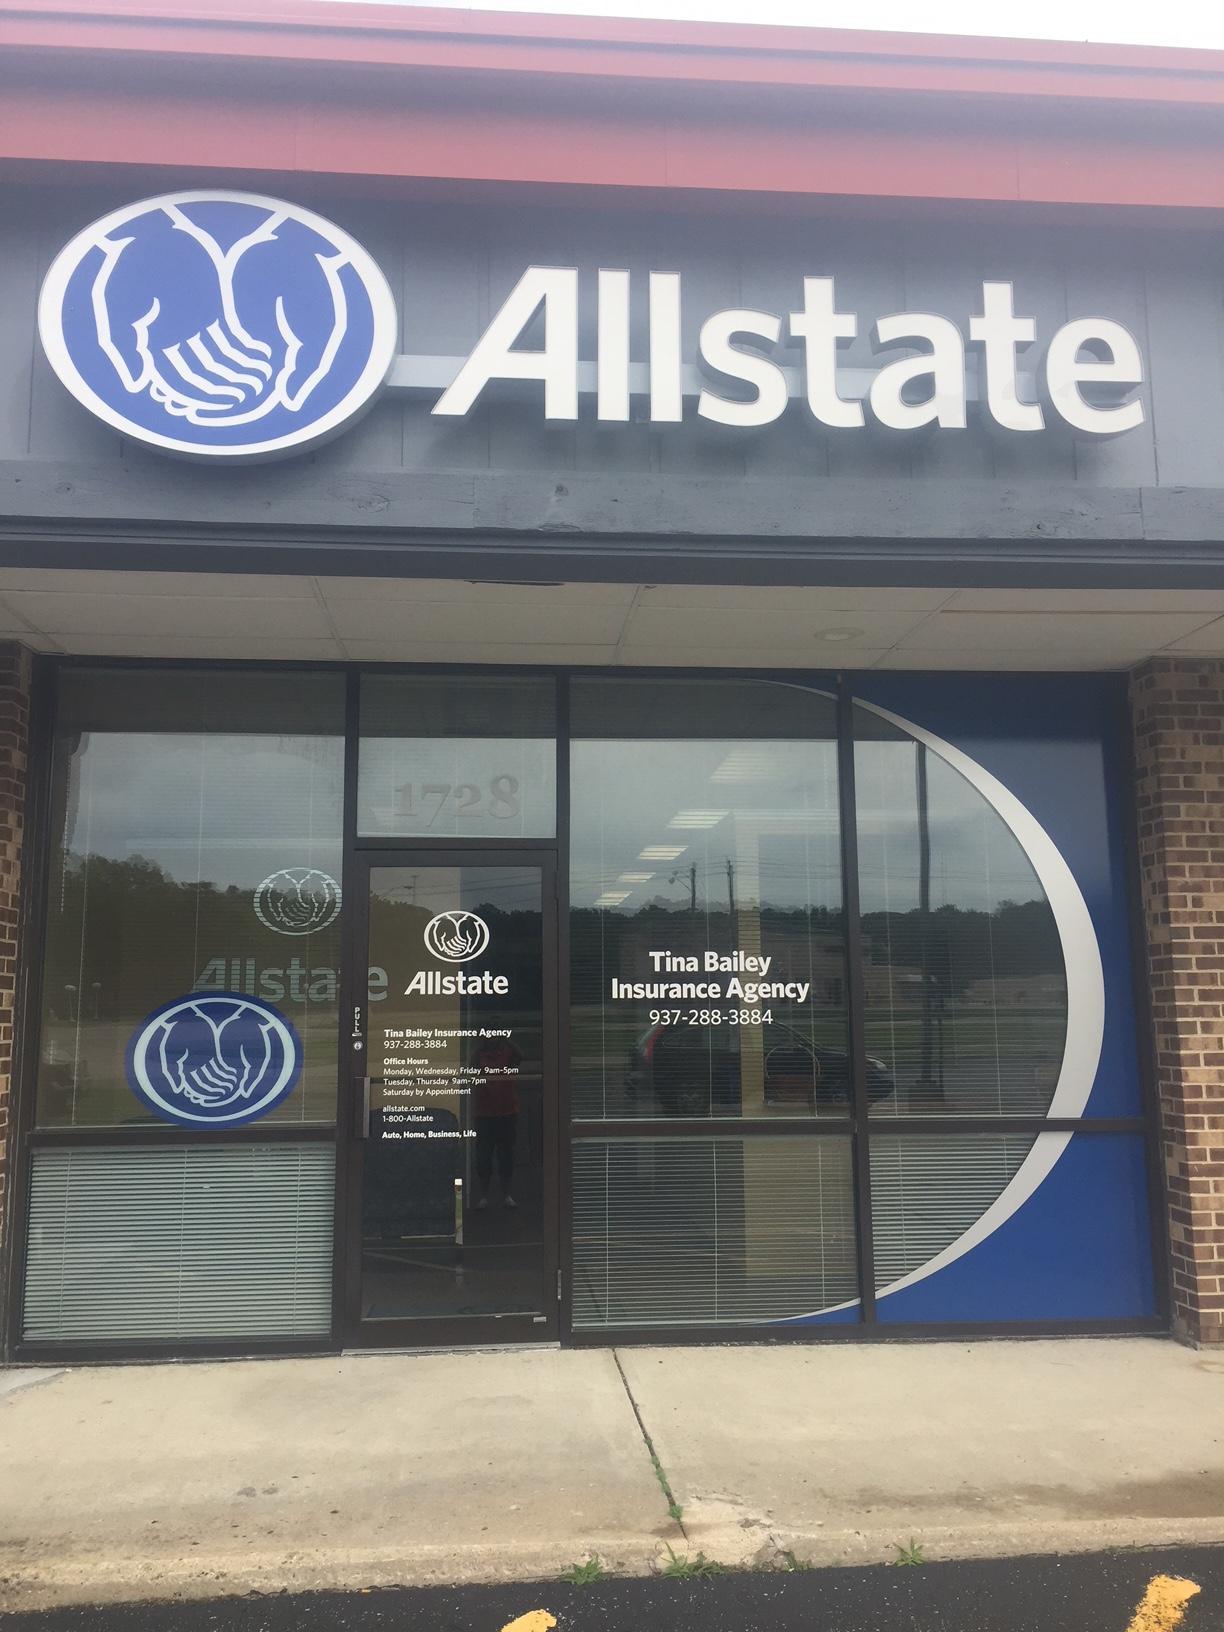 Tina Bailey: Allstate Insurance image 1